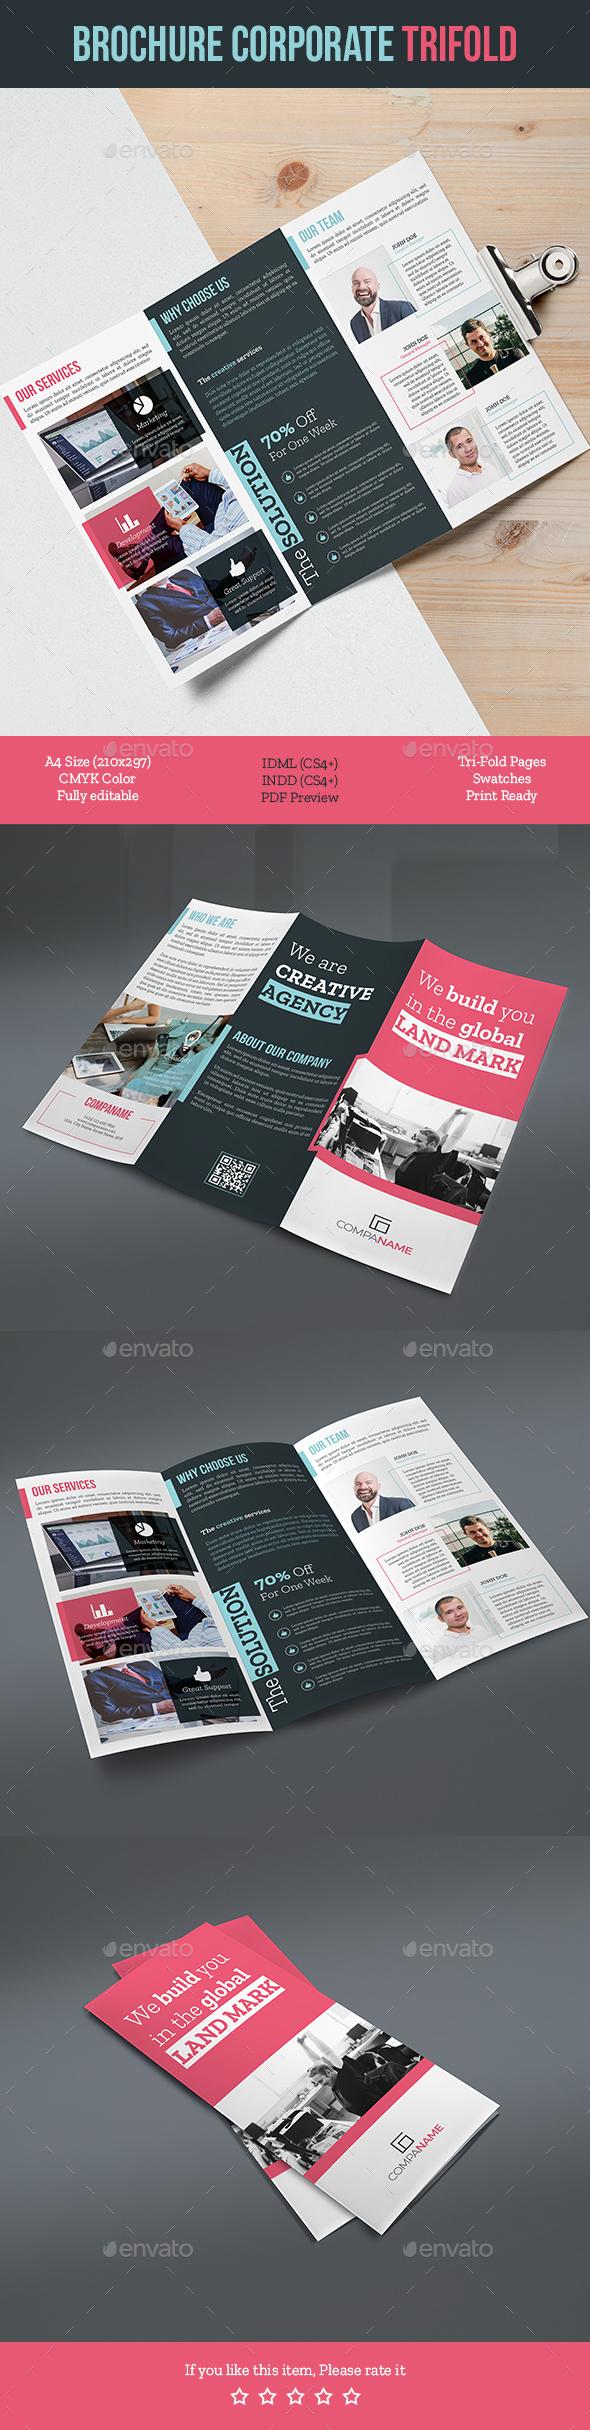 Brochure Corporate Trifold - Corporate Brochures